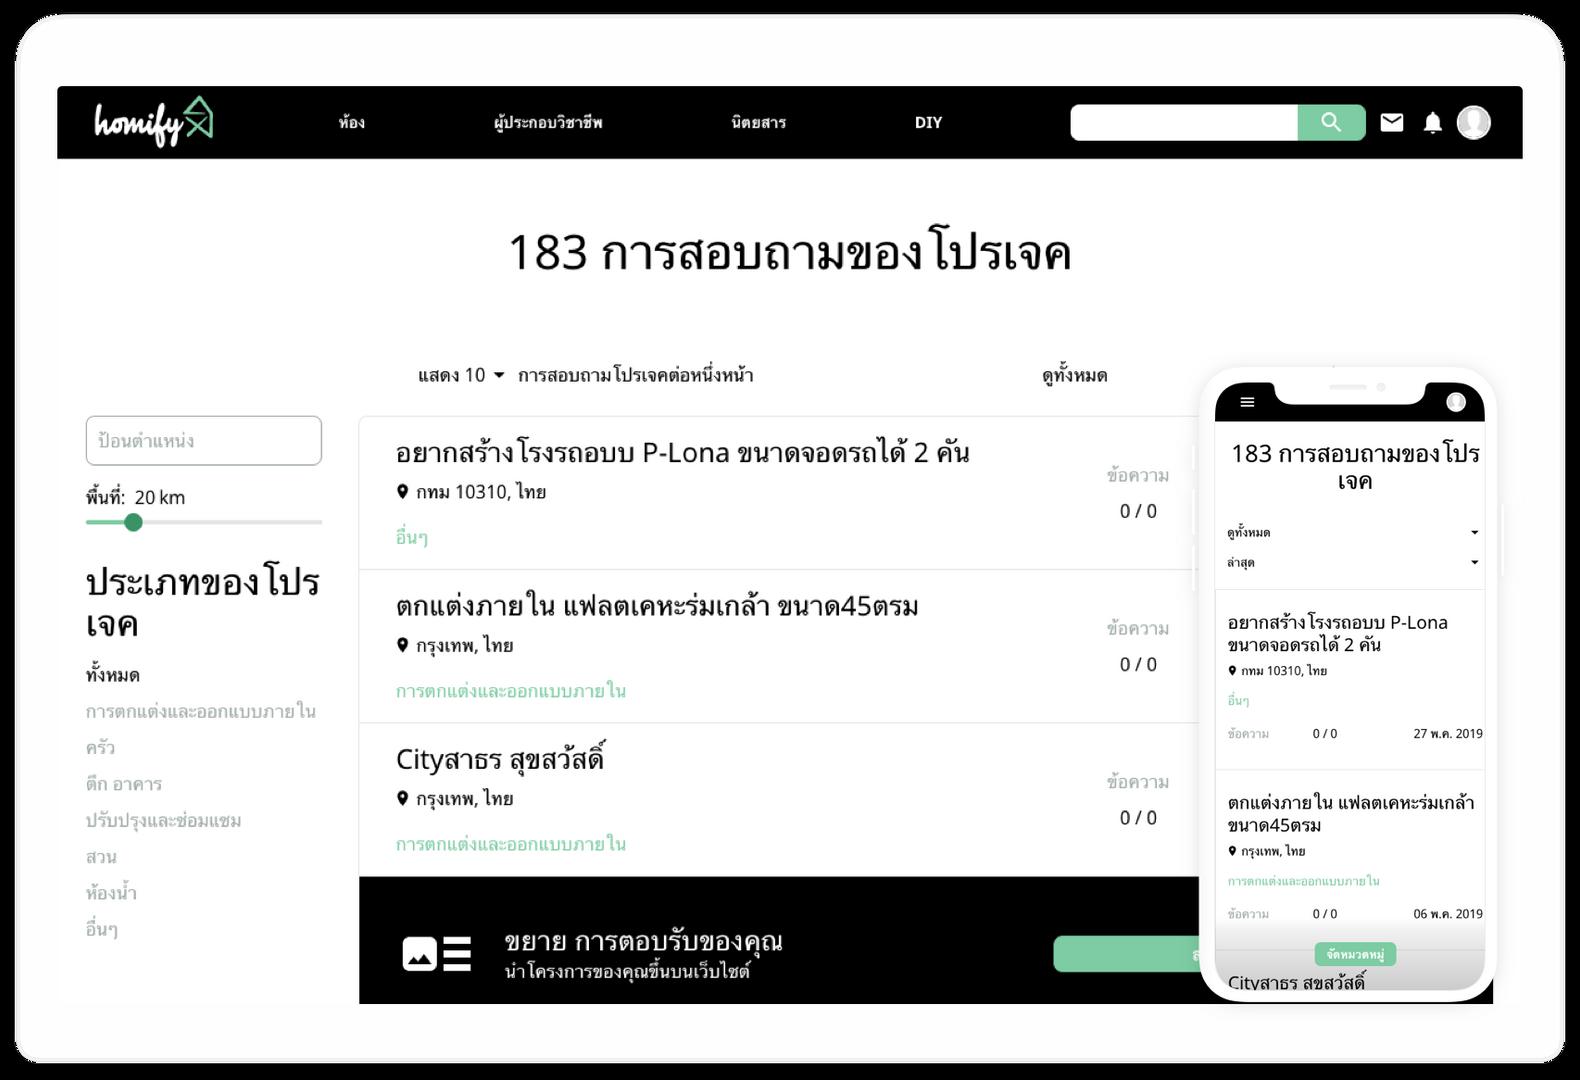 Th.png?ik sdk version=ruby 1.0